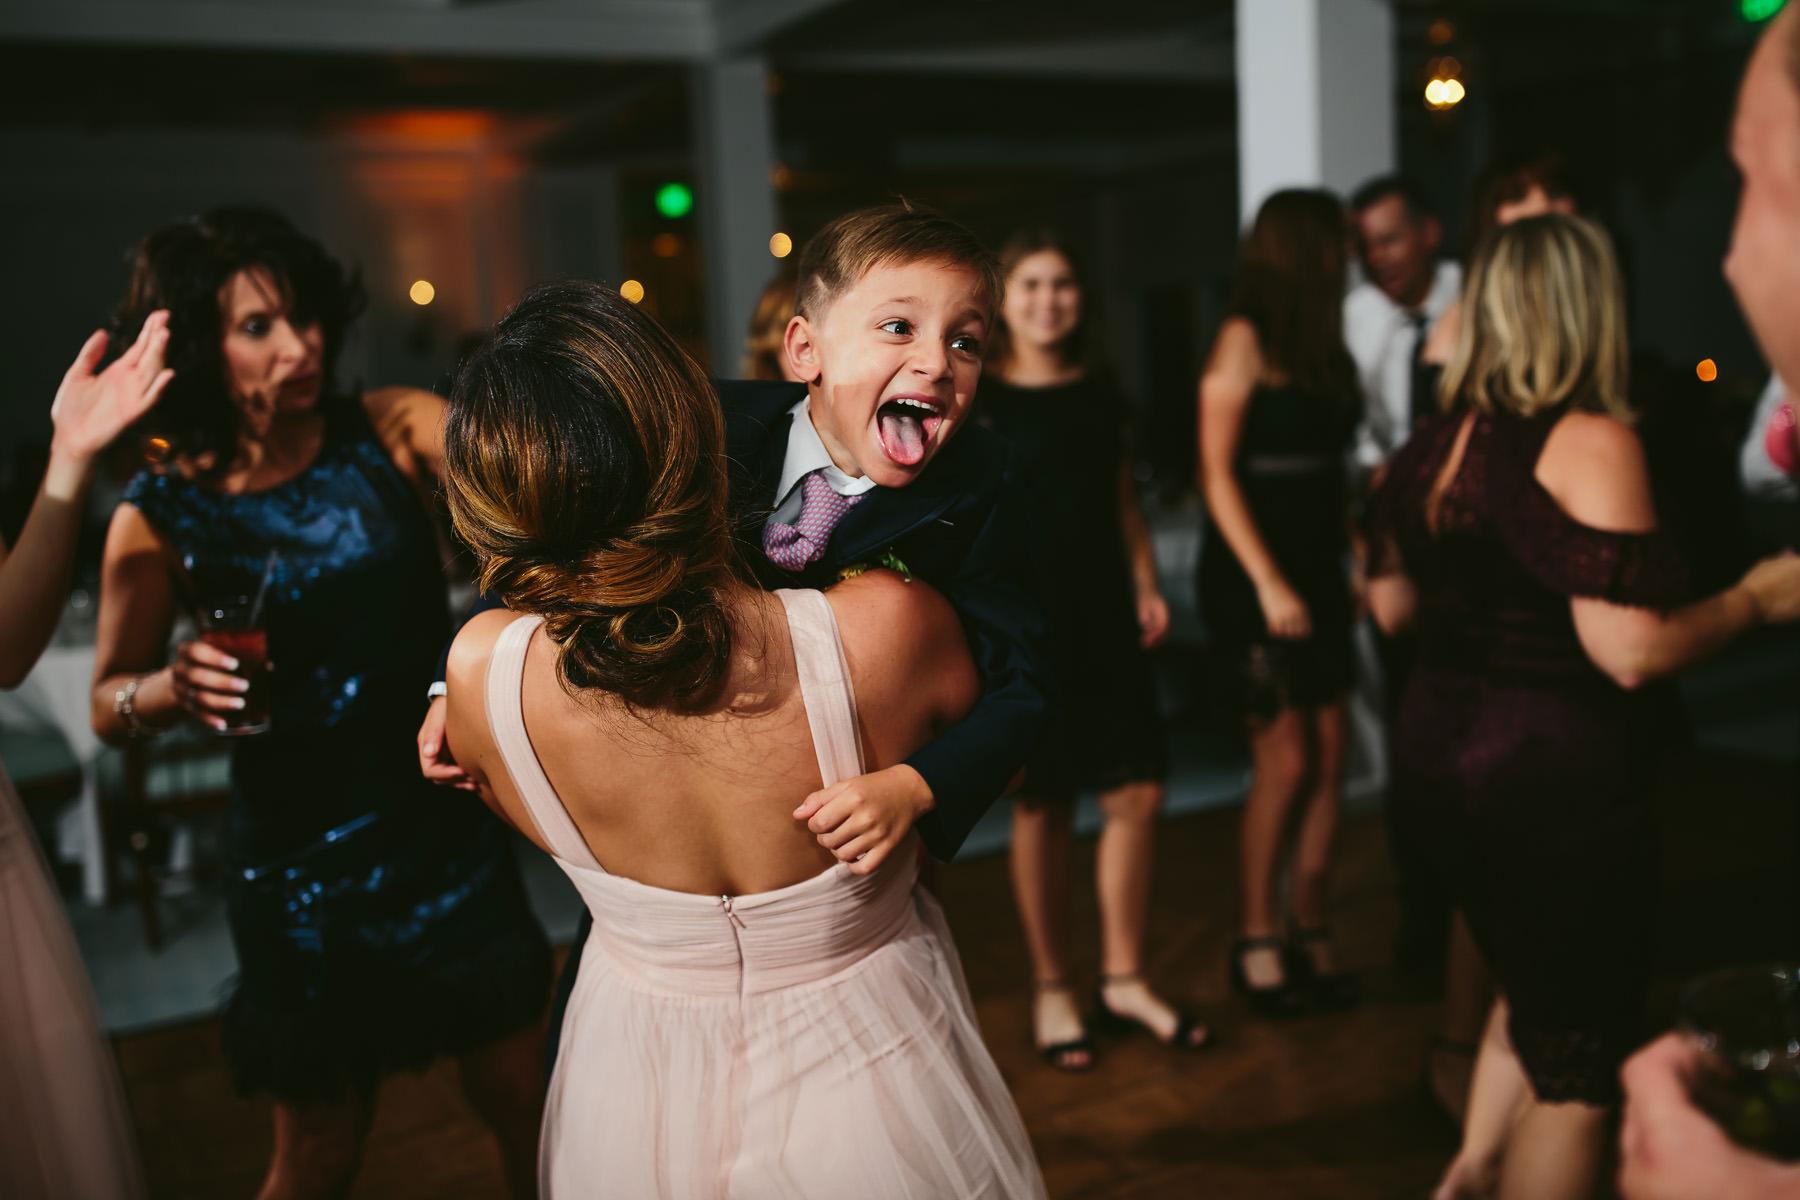 wedding-moments-tiny-house-photo-south-florida-wedding-photographer.jpg